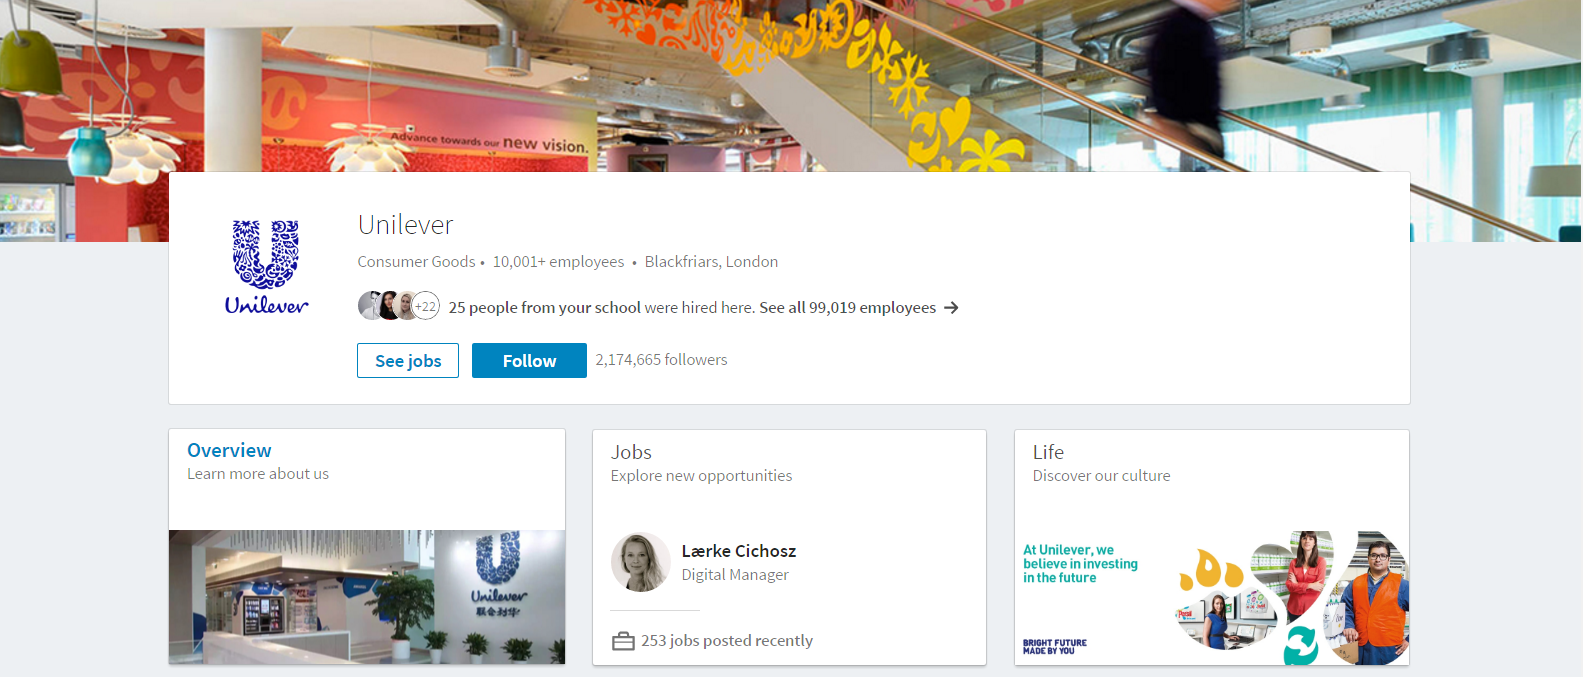 Unilevers company page